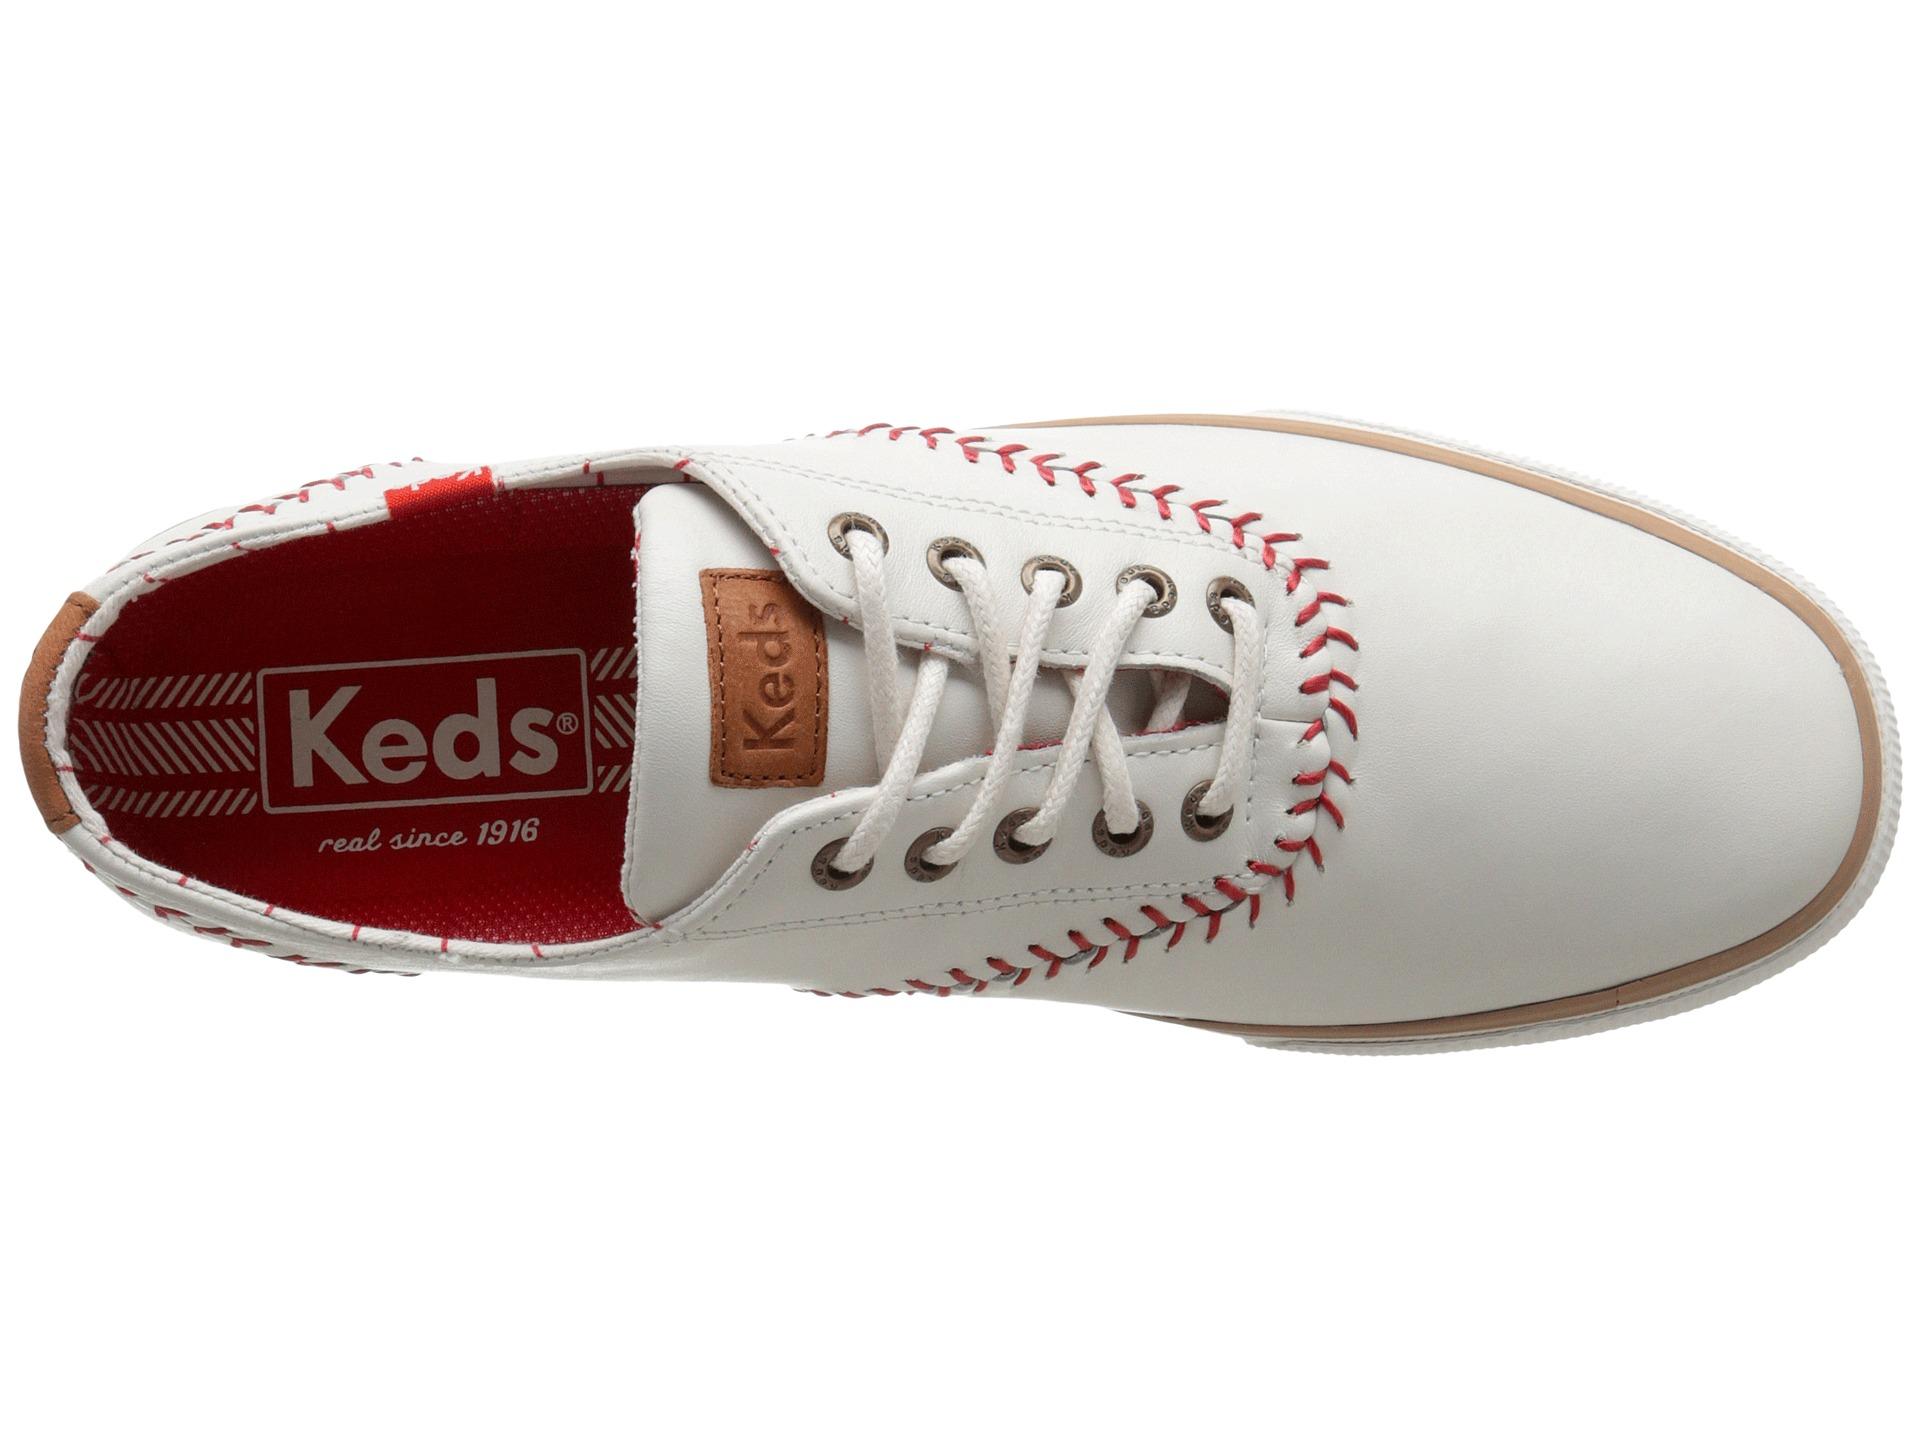 keds leather champion baseball shoes